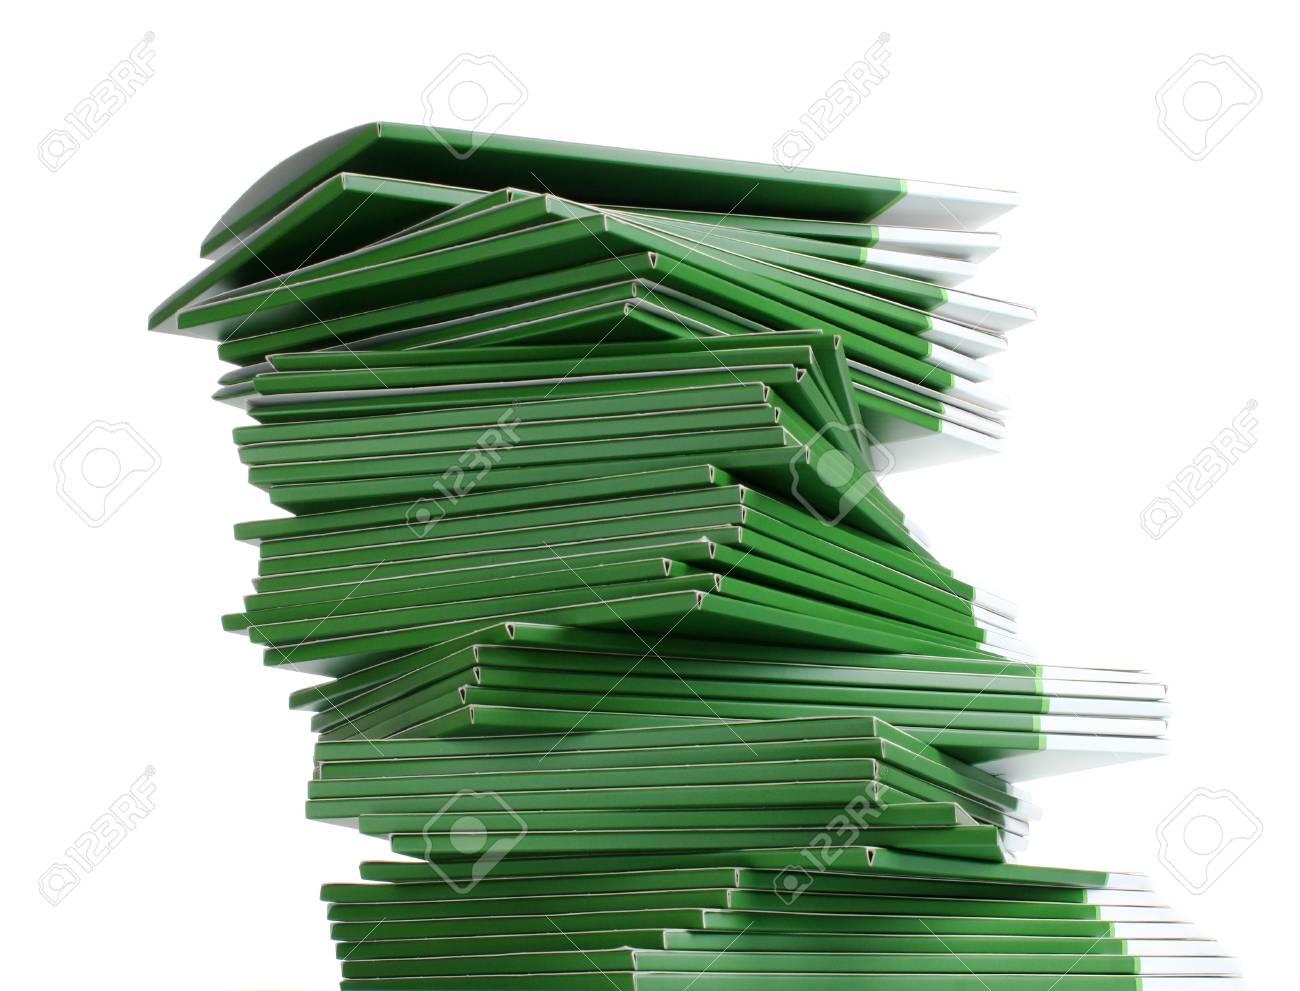 Many green folders isolated on white Stock Photo - 11337970